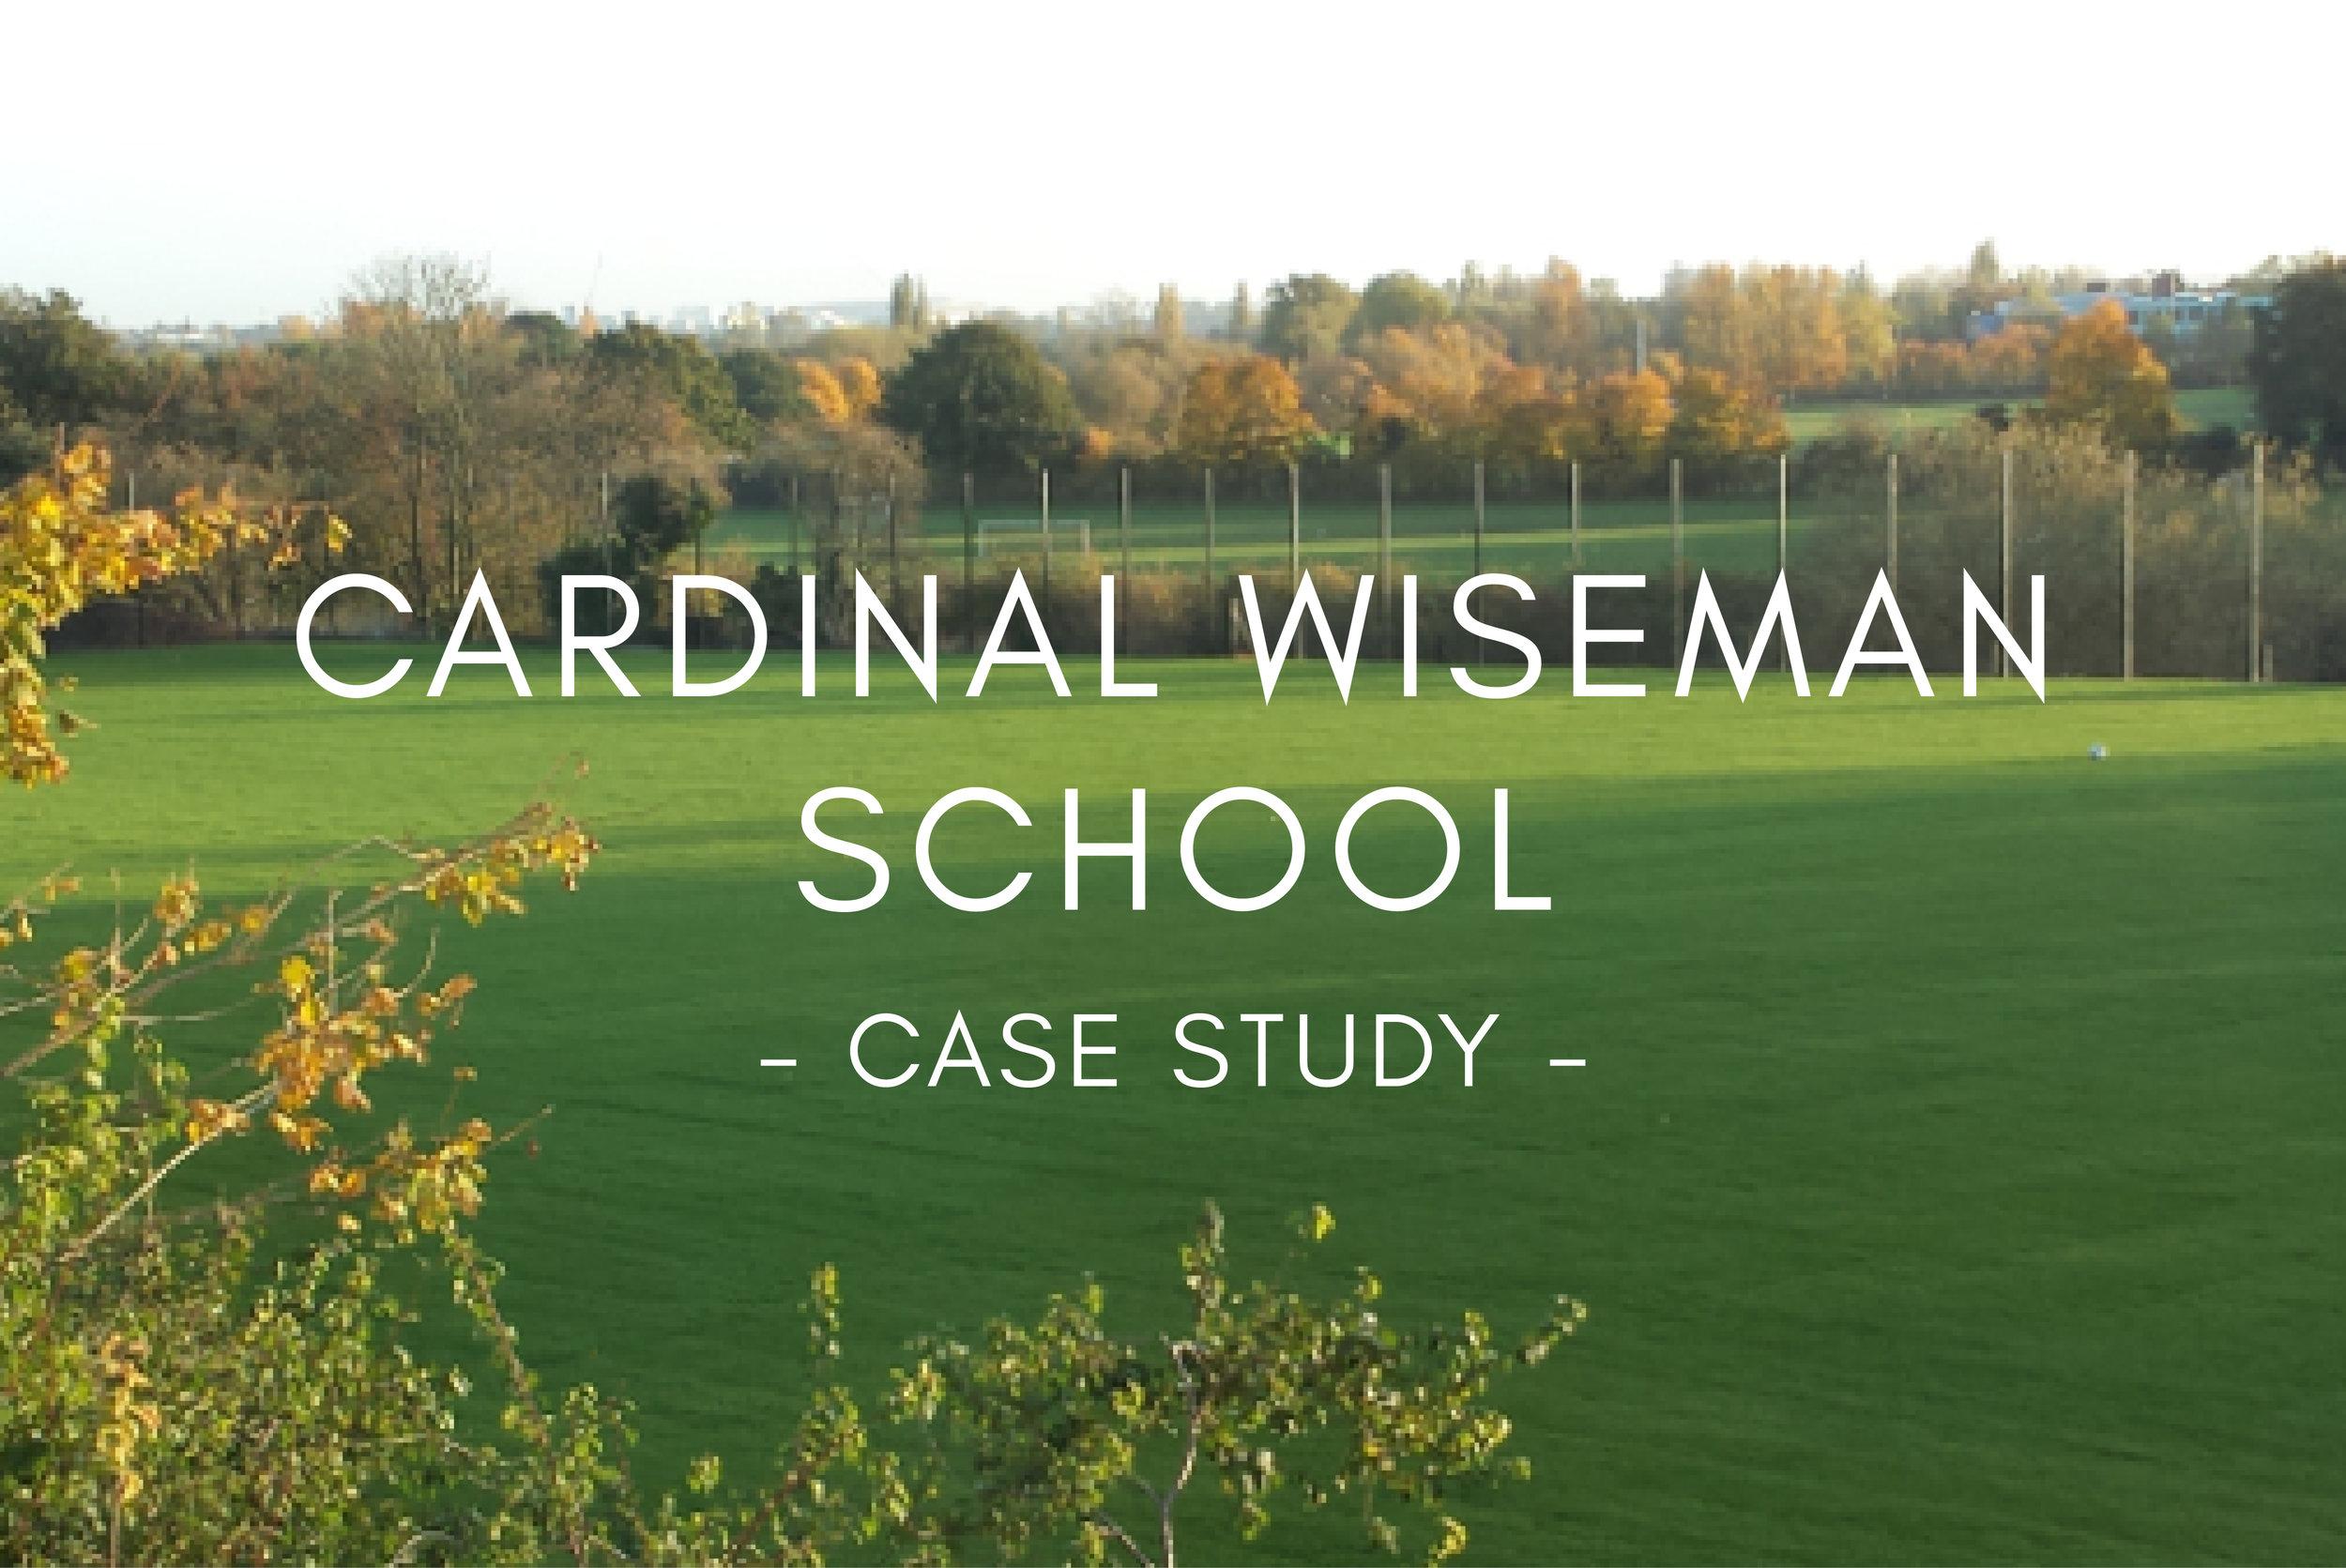 Portfolio - Cardinal Wiseman School Pitch Design & Construction